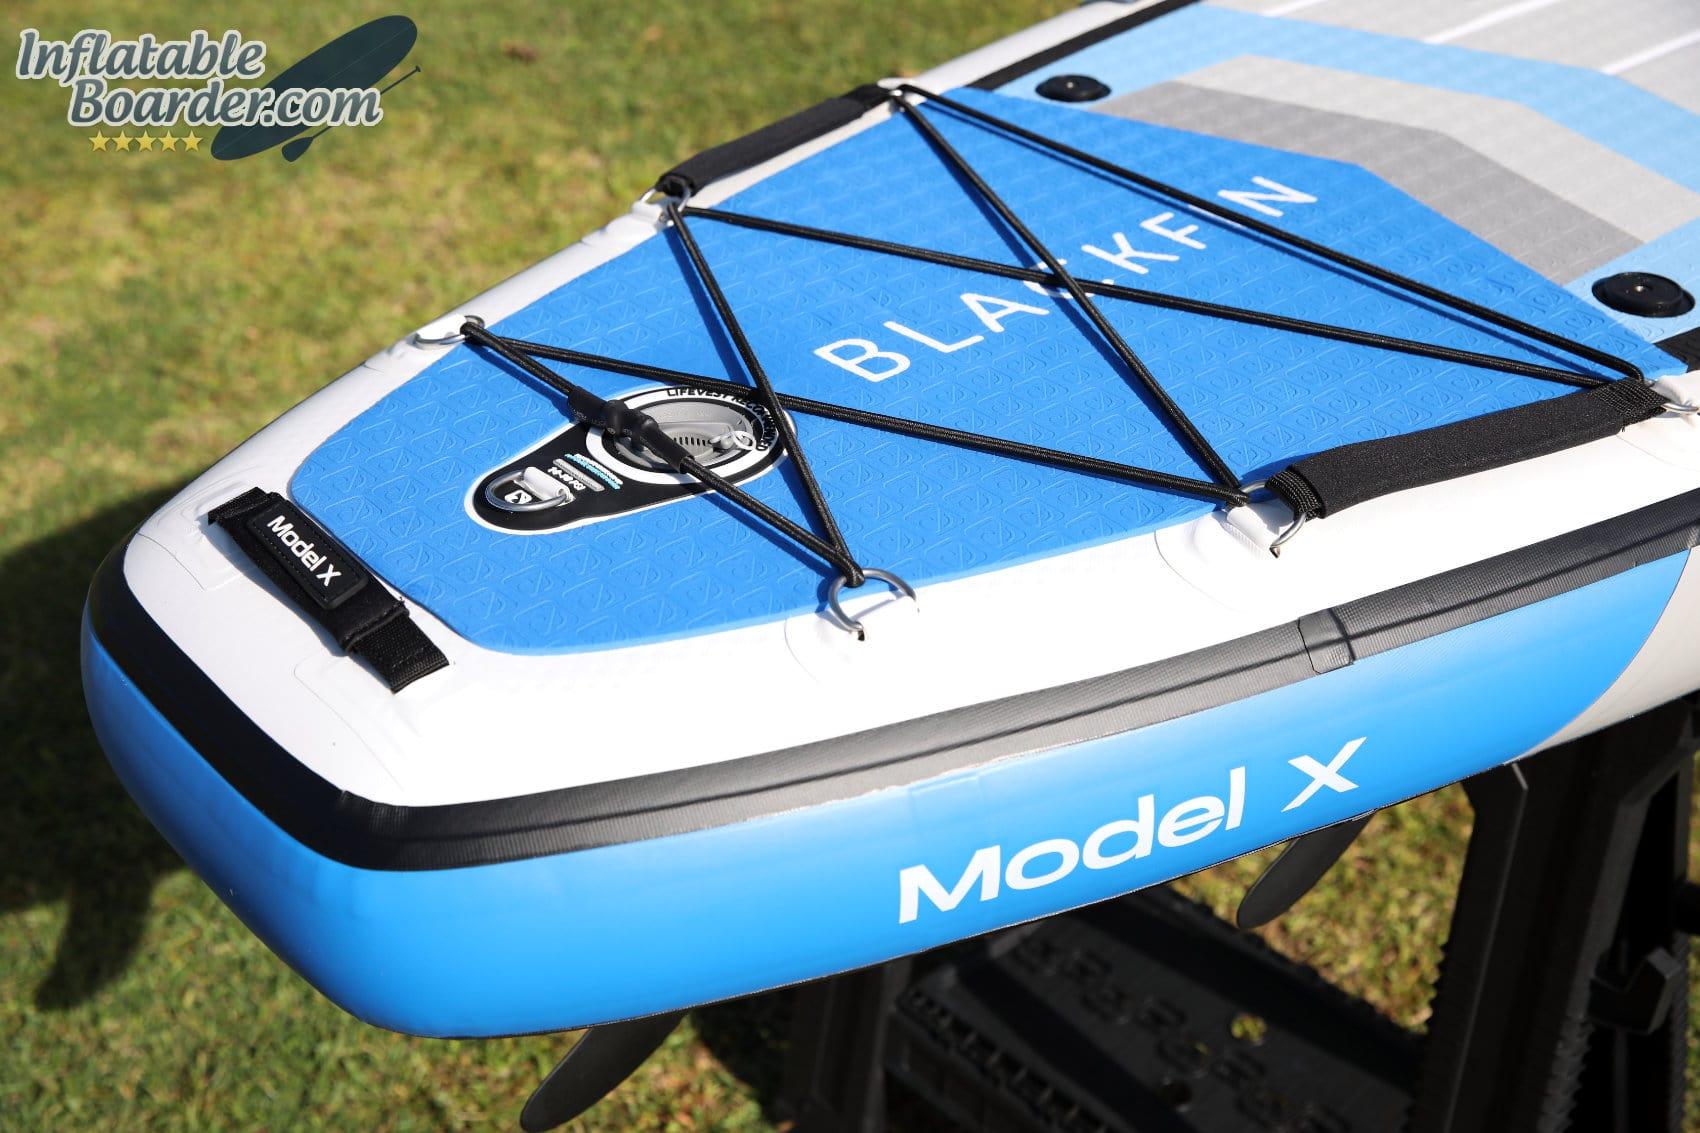 Model X Tail